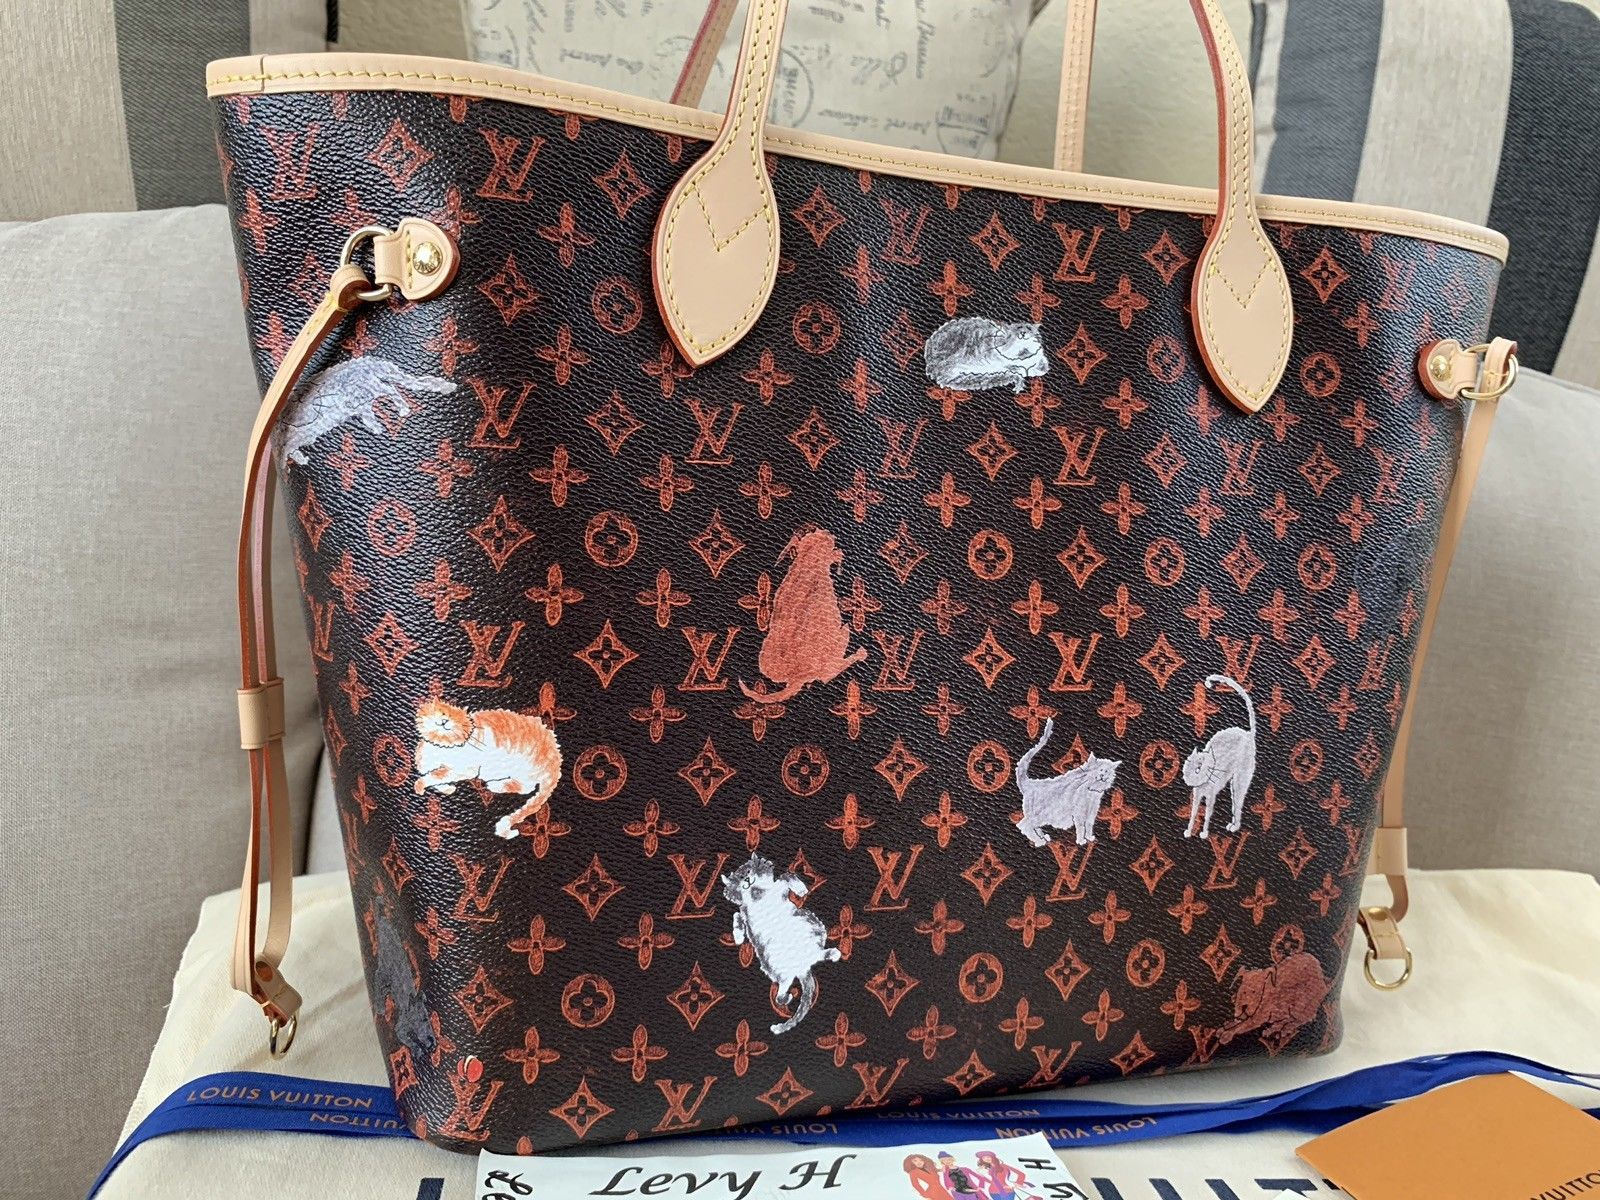 d7330f617312 Details about Authentic Louis Vuitton Neverfull MM Monogram V ...